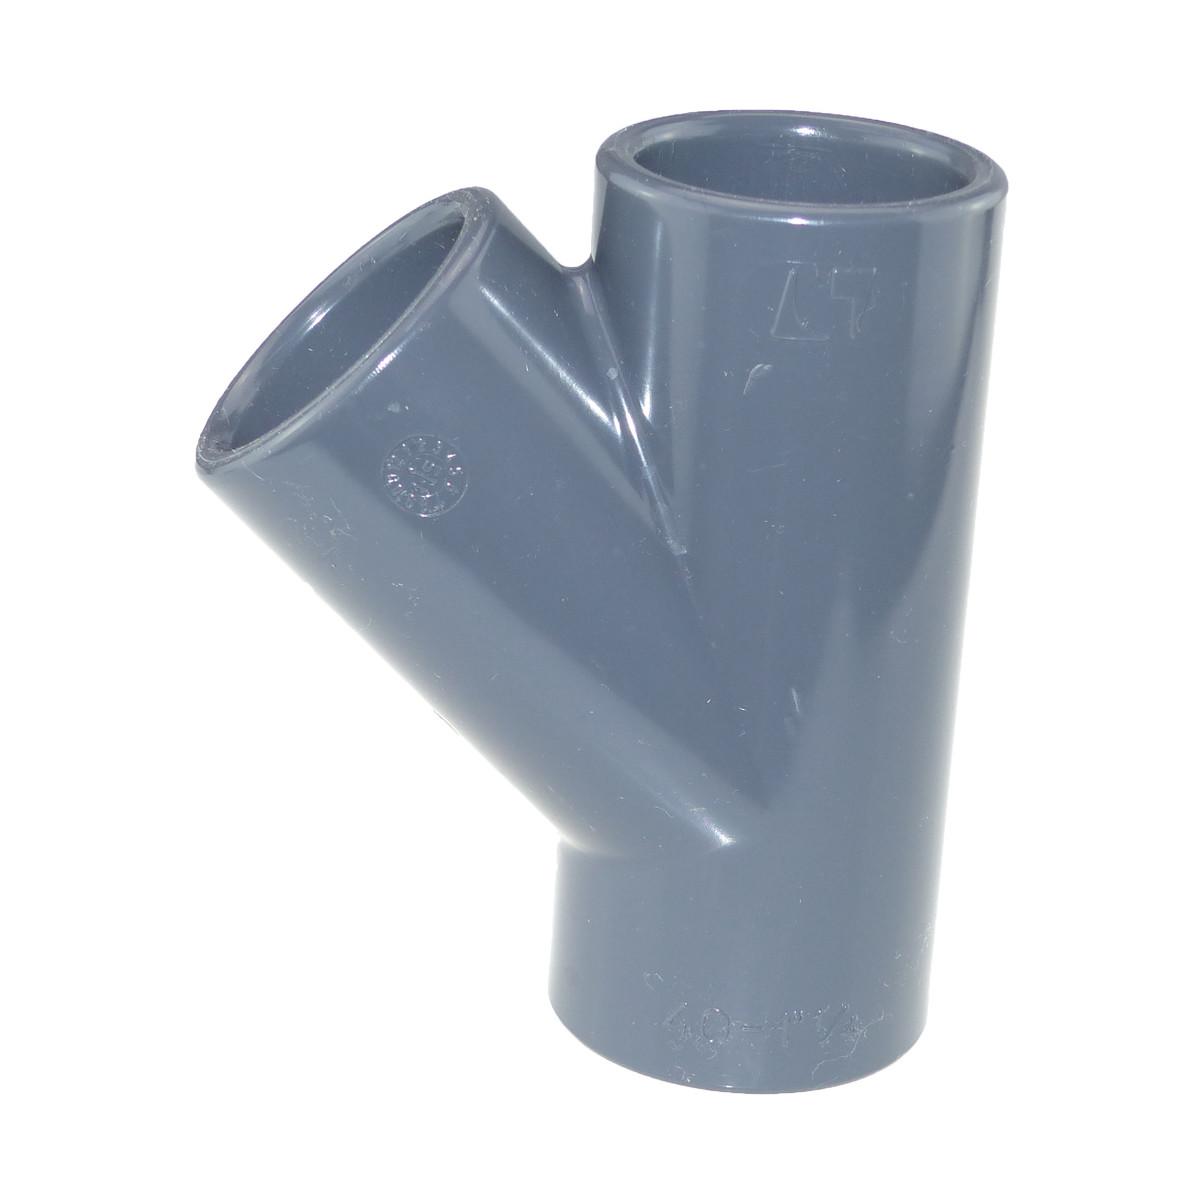 Cepex/Plimat/CH PVC T-Stck 45 Grad Klebemuffe 32 mm